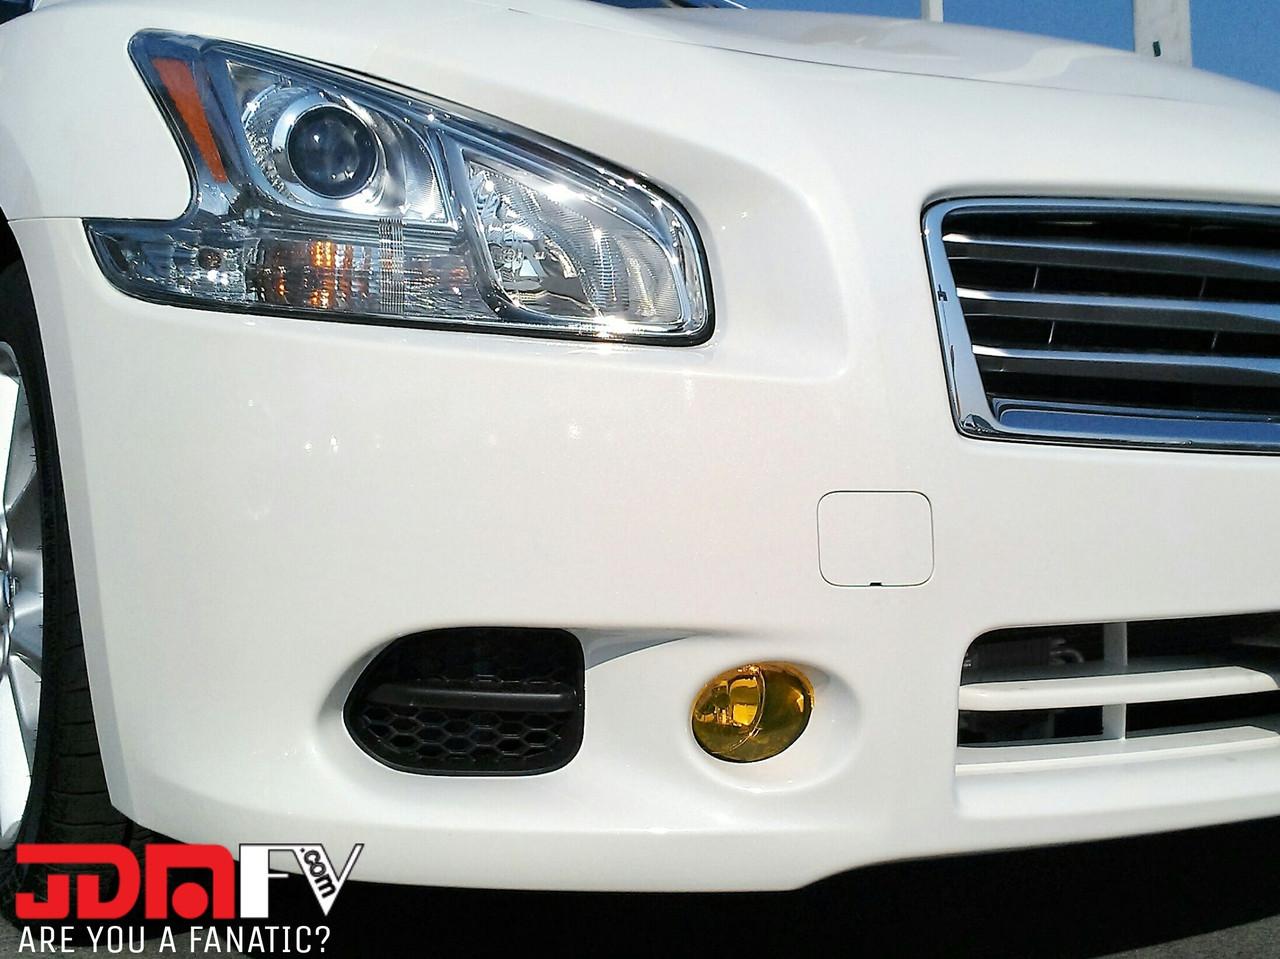 09 12 Nissan Maxima Precut Yellow Fog Light Overlays Tint Saab 9 3 Lights Wiring Diagram Image 1